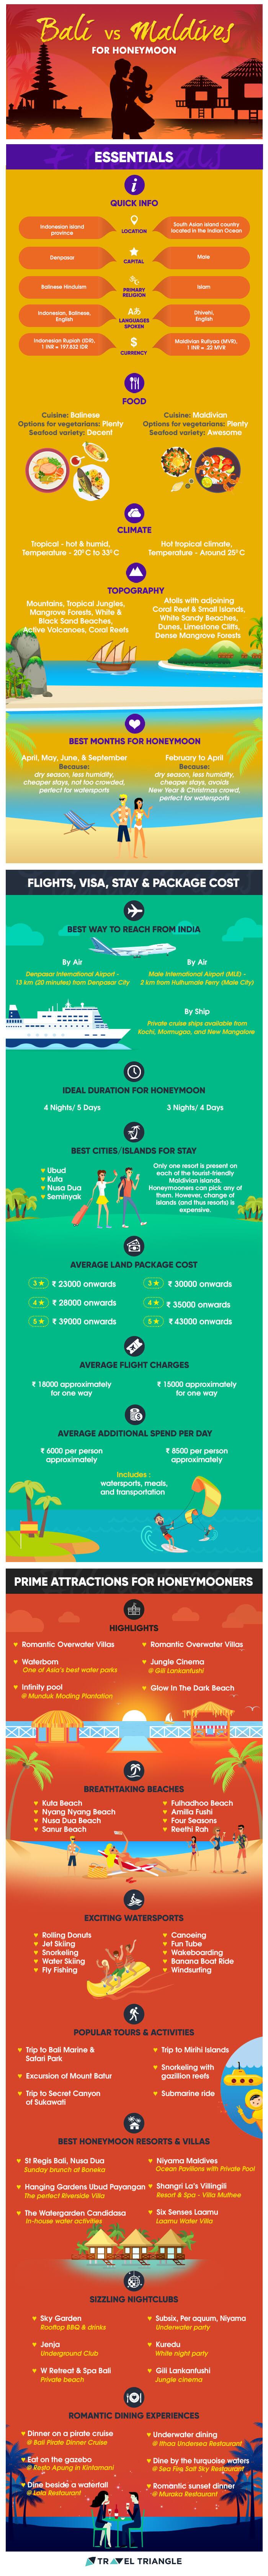 Bali Vs Maldives For Honeymoon: Compare The Two